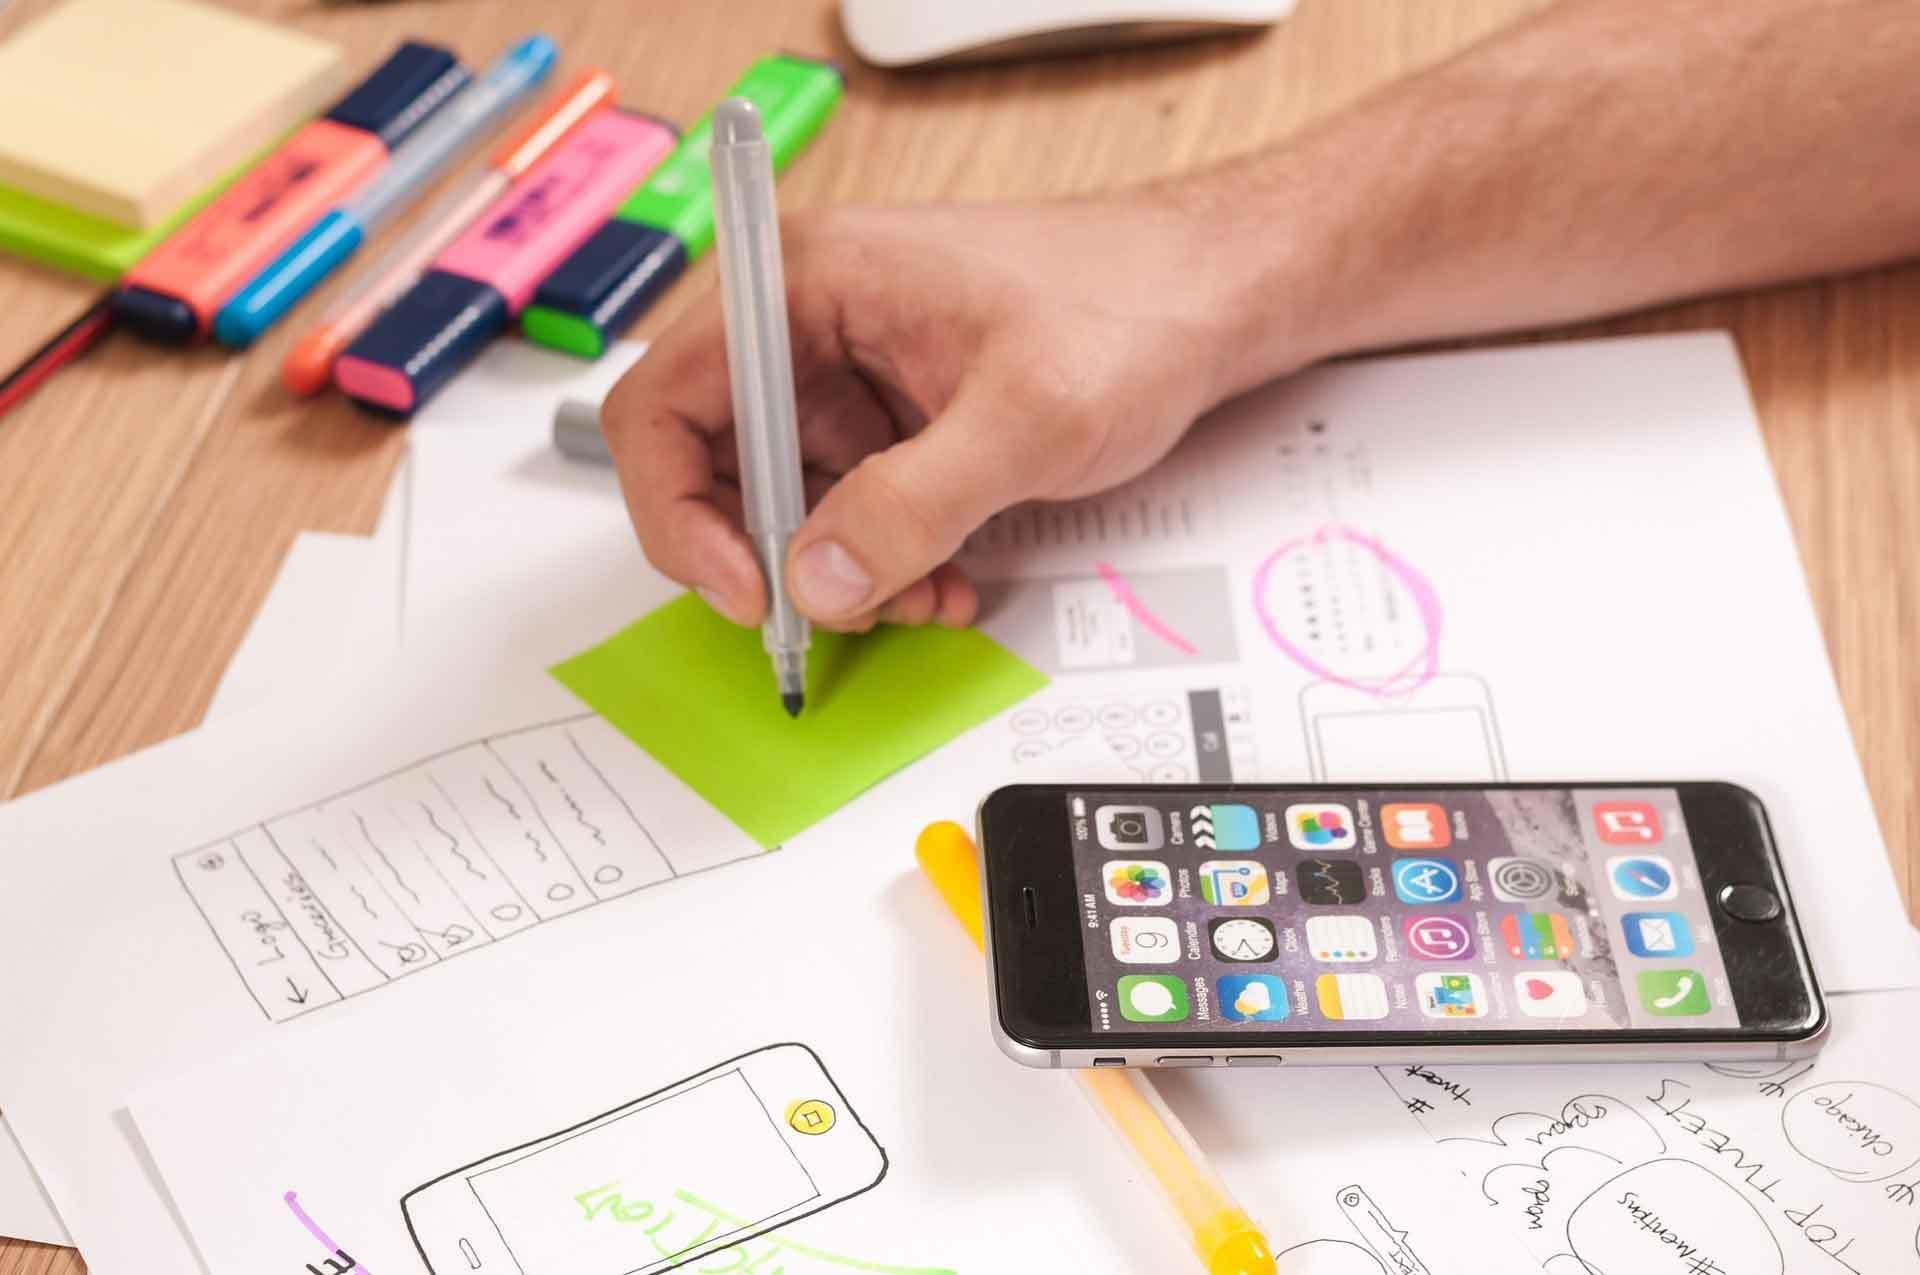 Mobile UI Design Trends in 2018